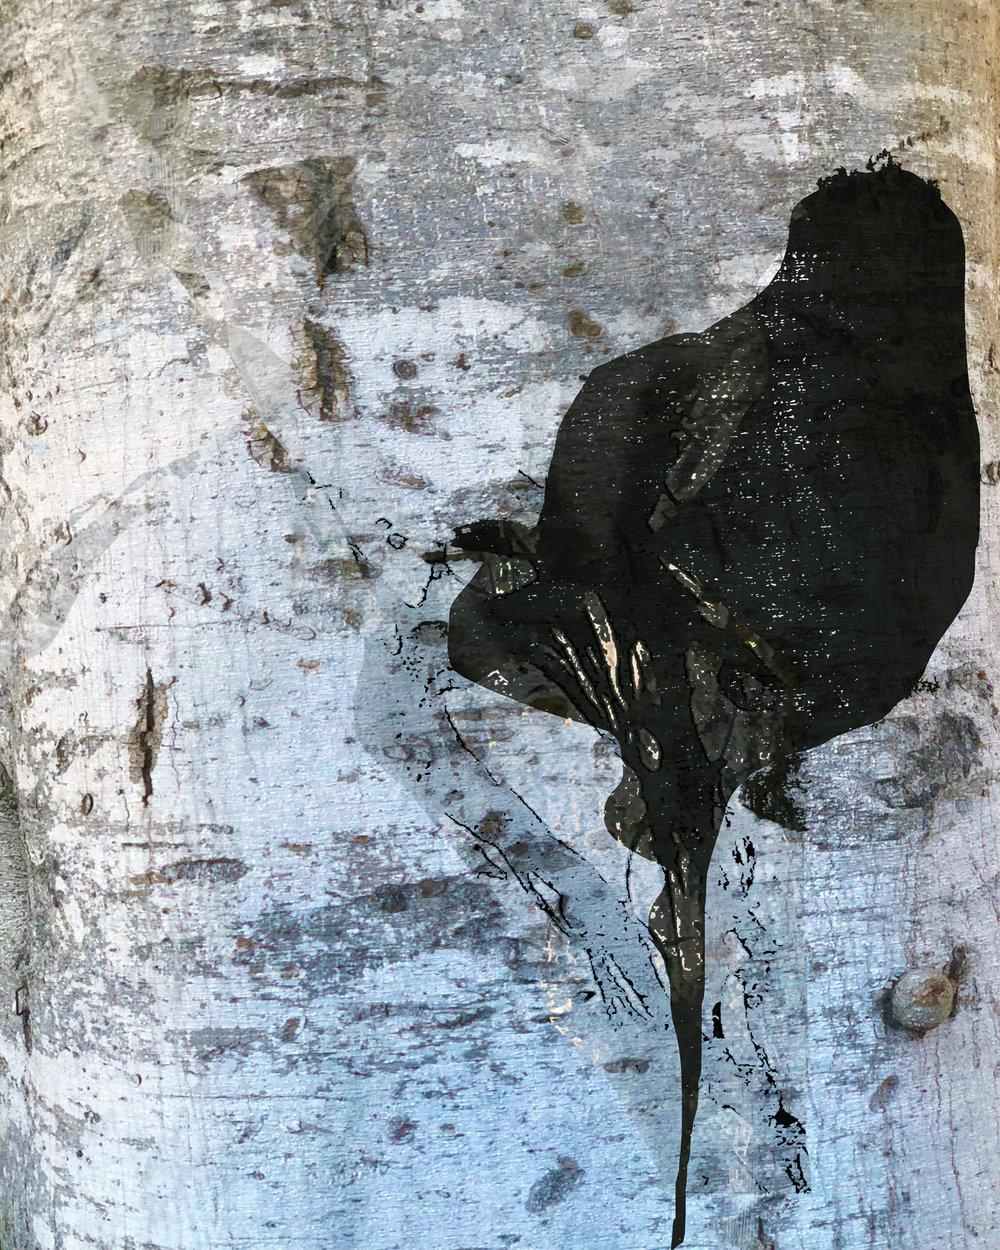 Birch and Black